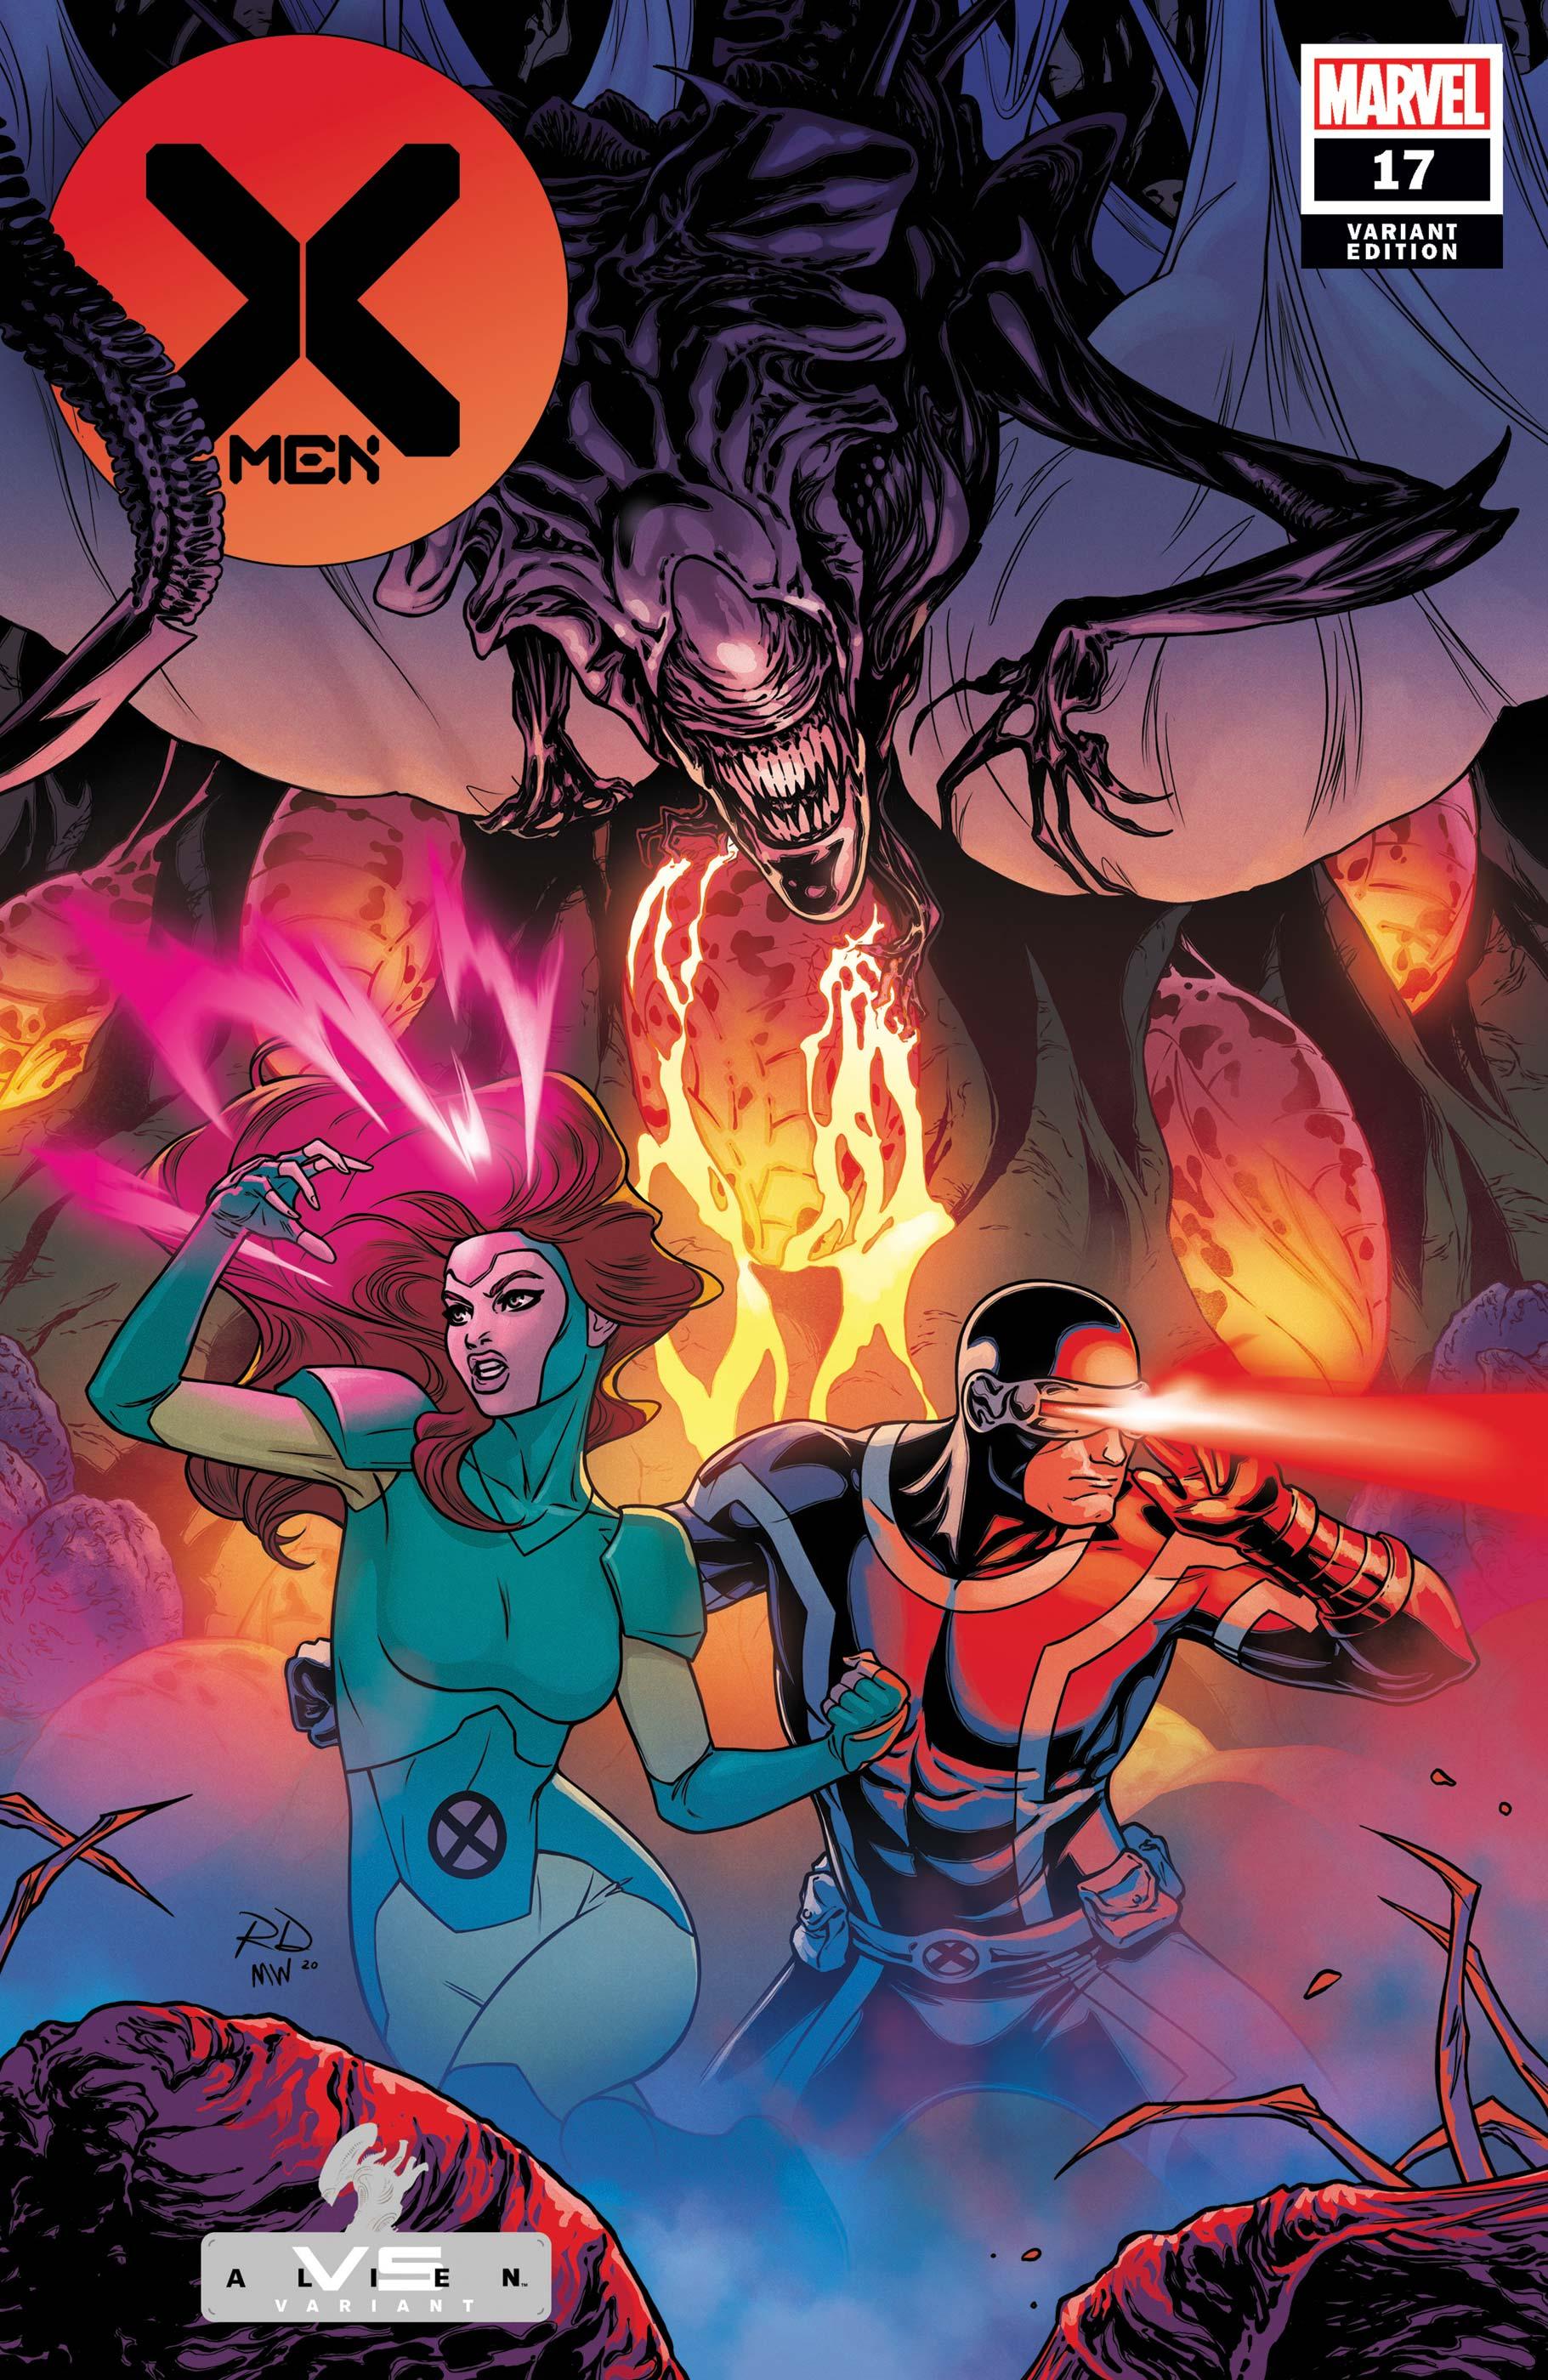 X-Men (2019) #17 (Variant)